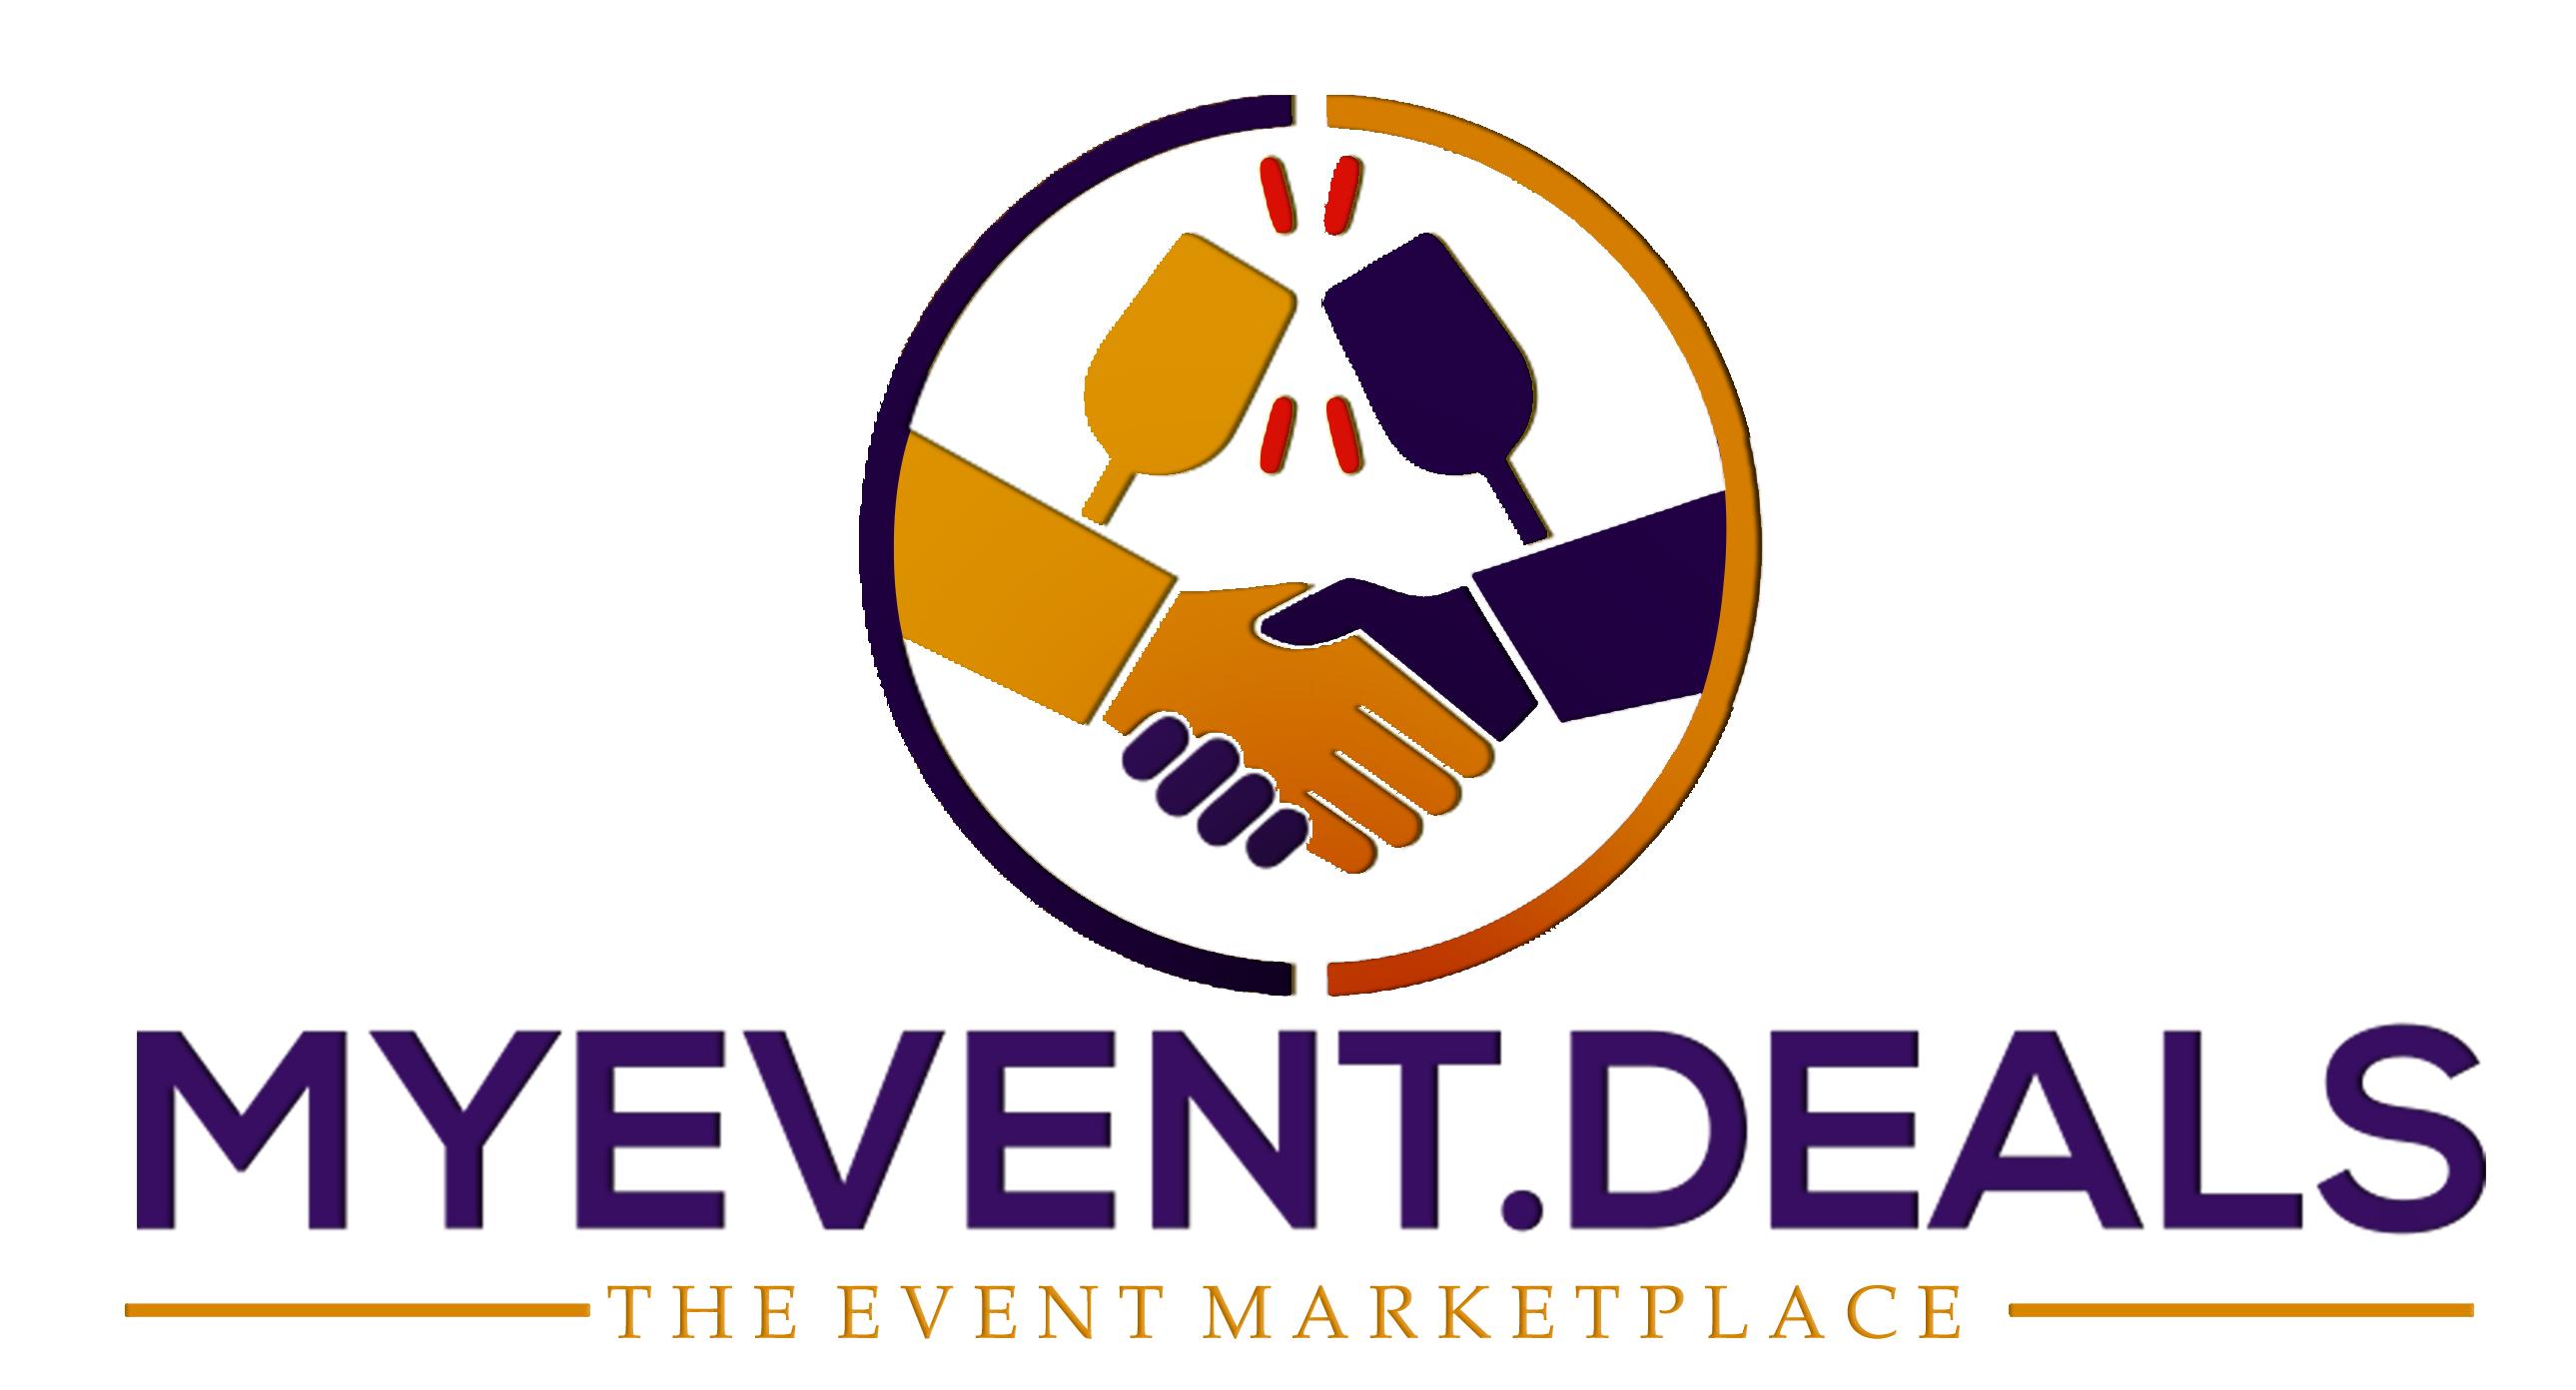 MyEvent.Deals